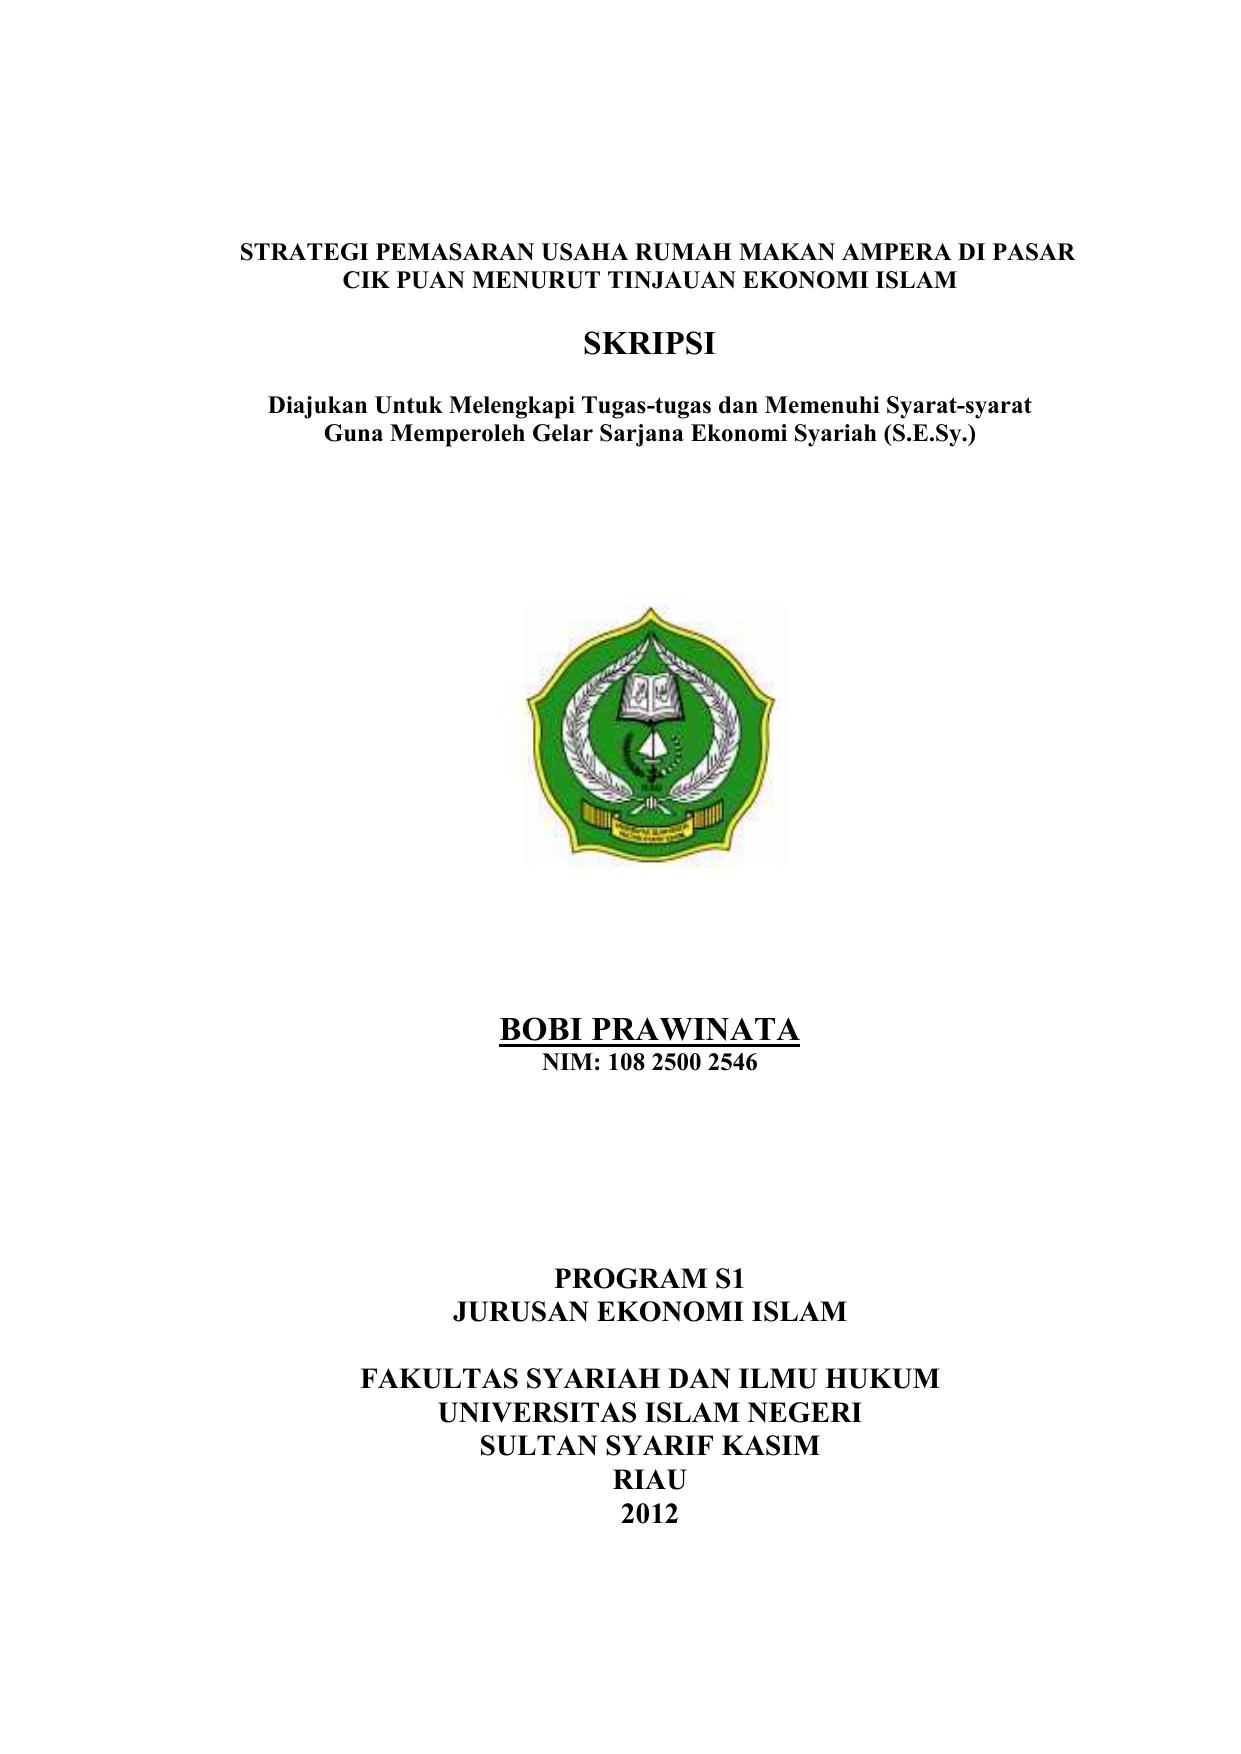 Skripsi Bobi Prawinata Repository Uin Suska